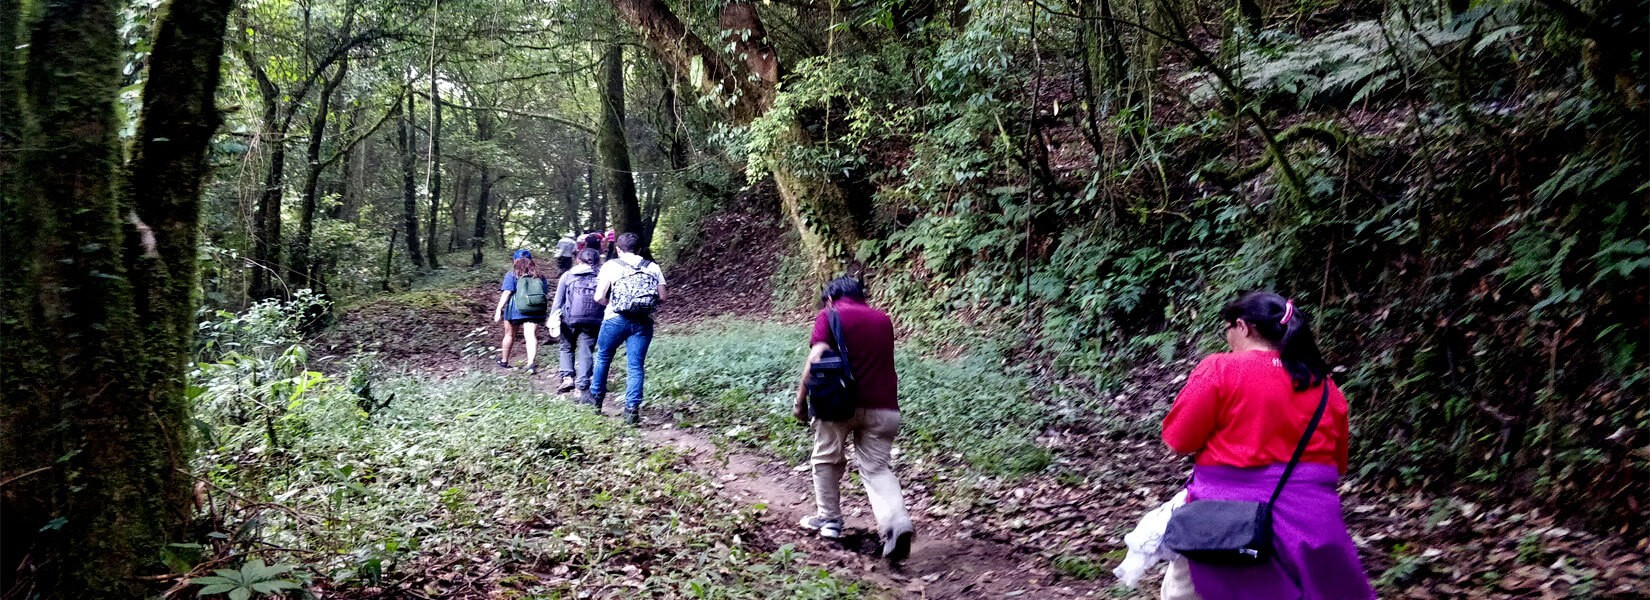 Kakani Suryachaur Day Hiking